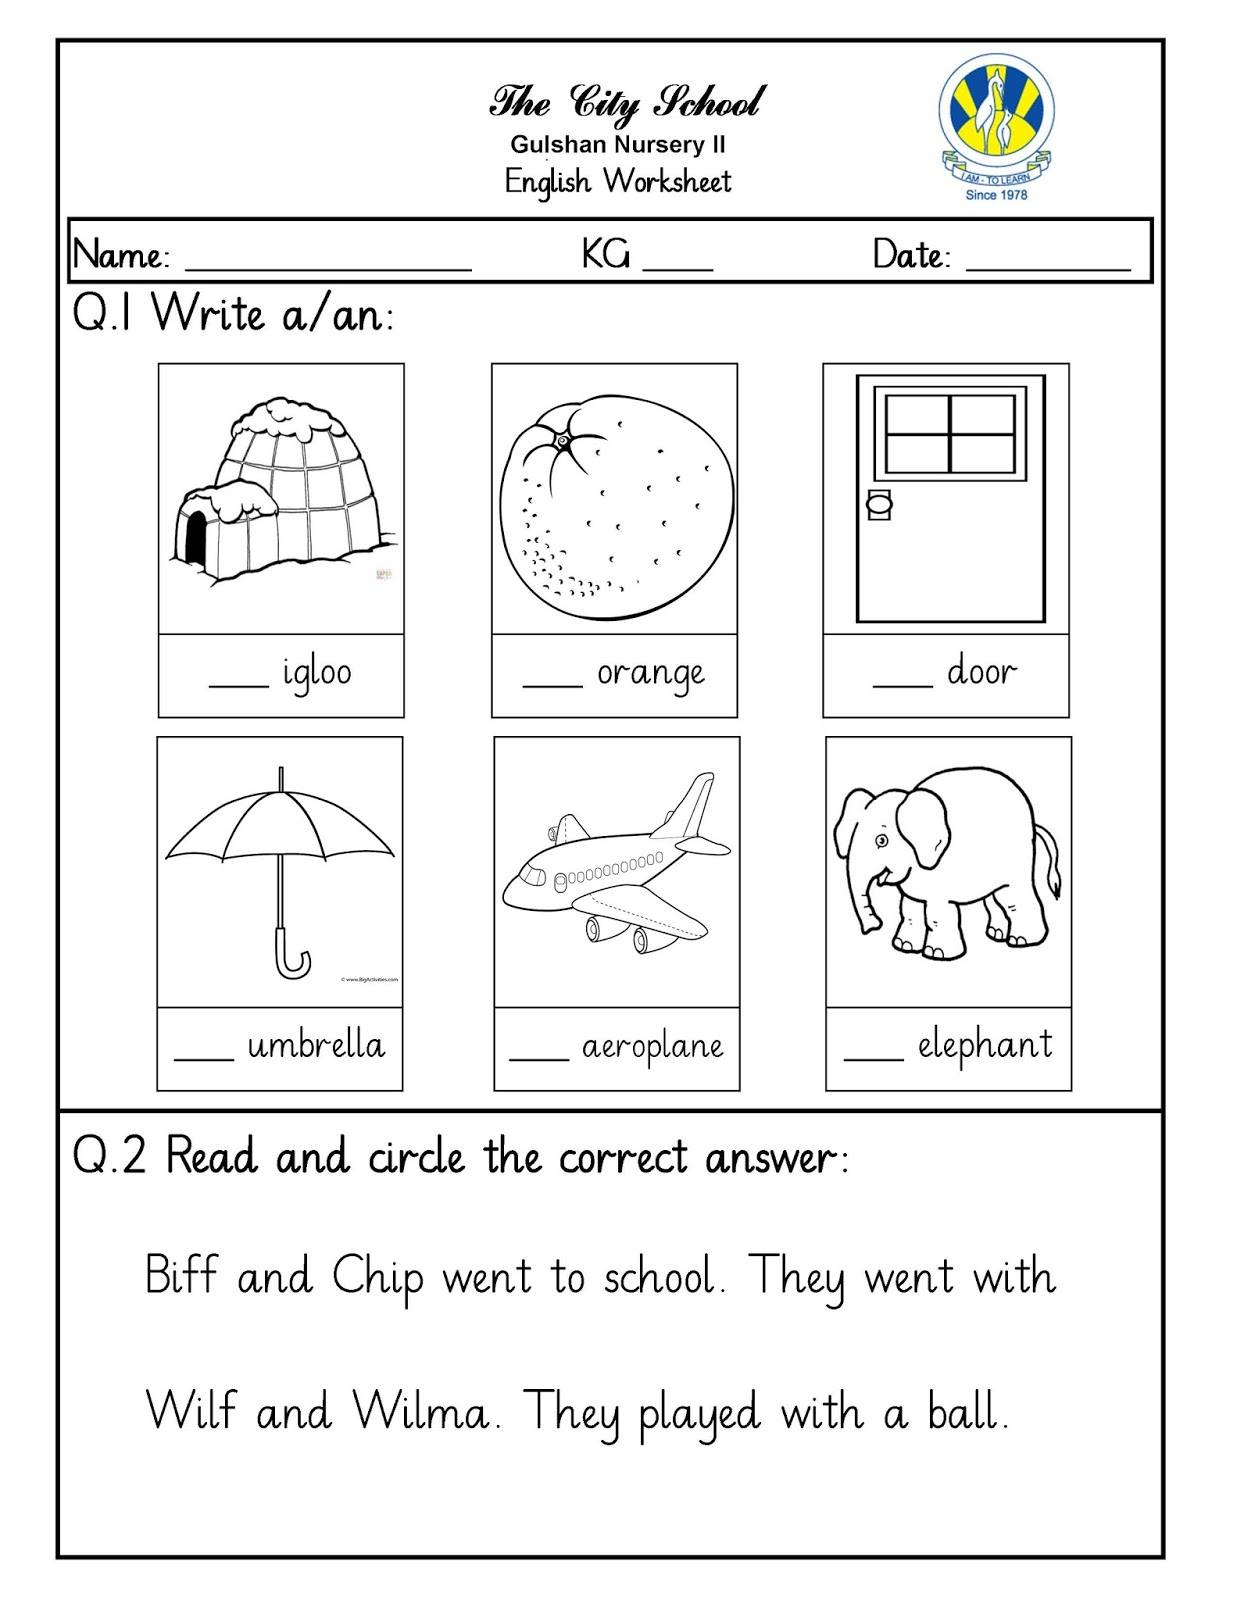 Sr Gulshan The City Nursery Ii English Kuwa And Math